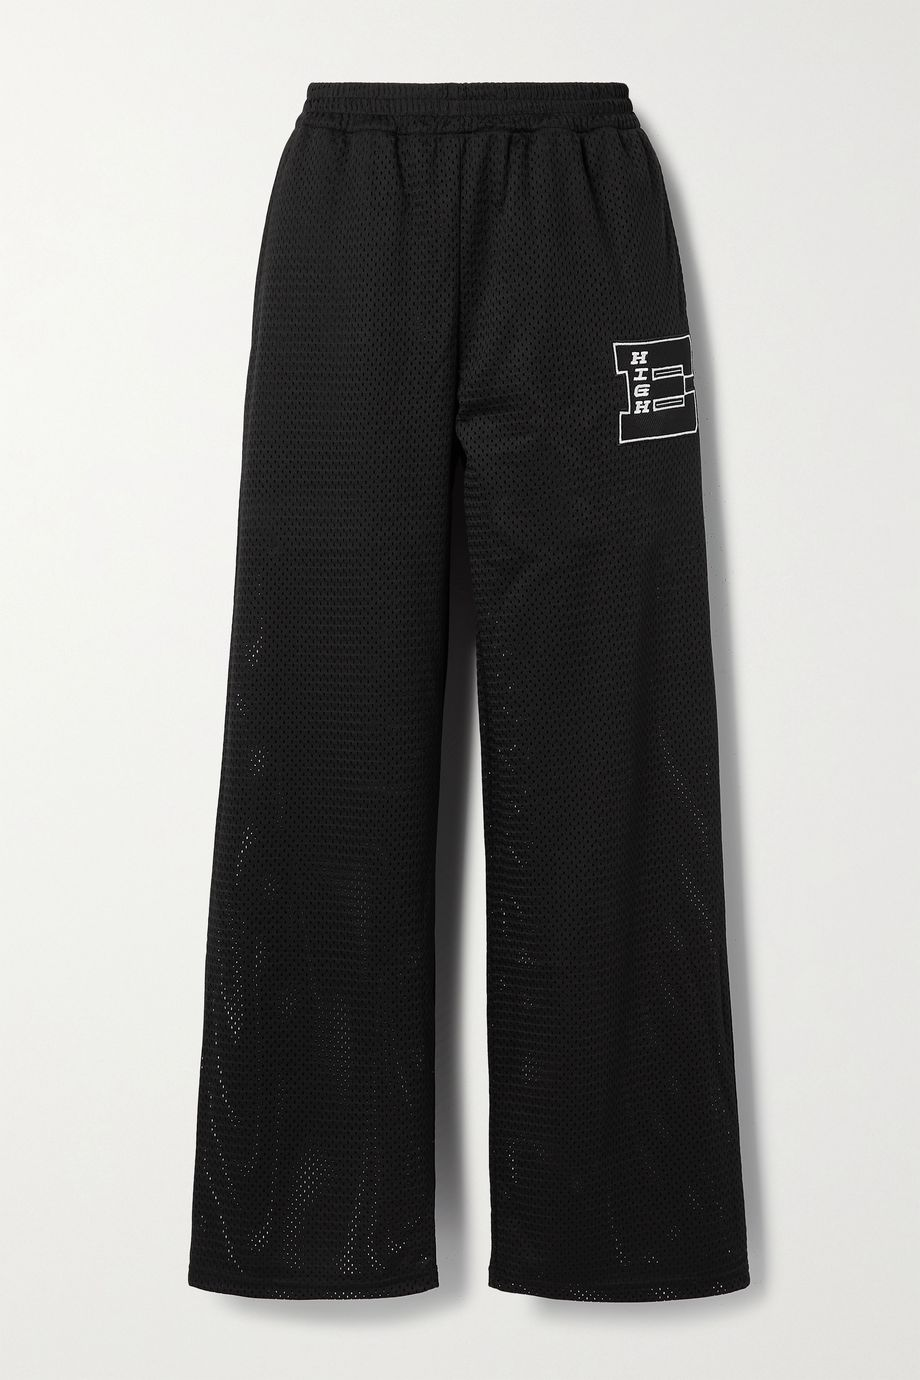 MCQ Eden High appliquéd printed mesh track pants